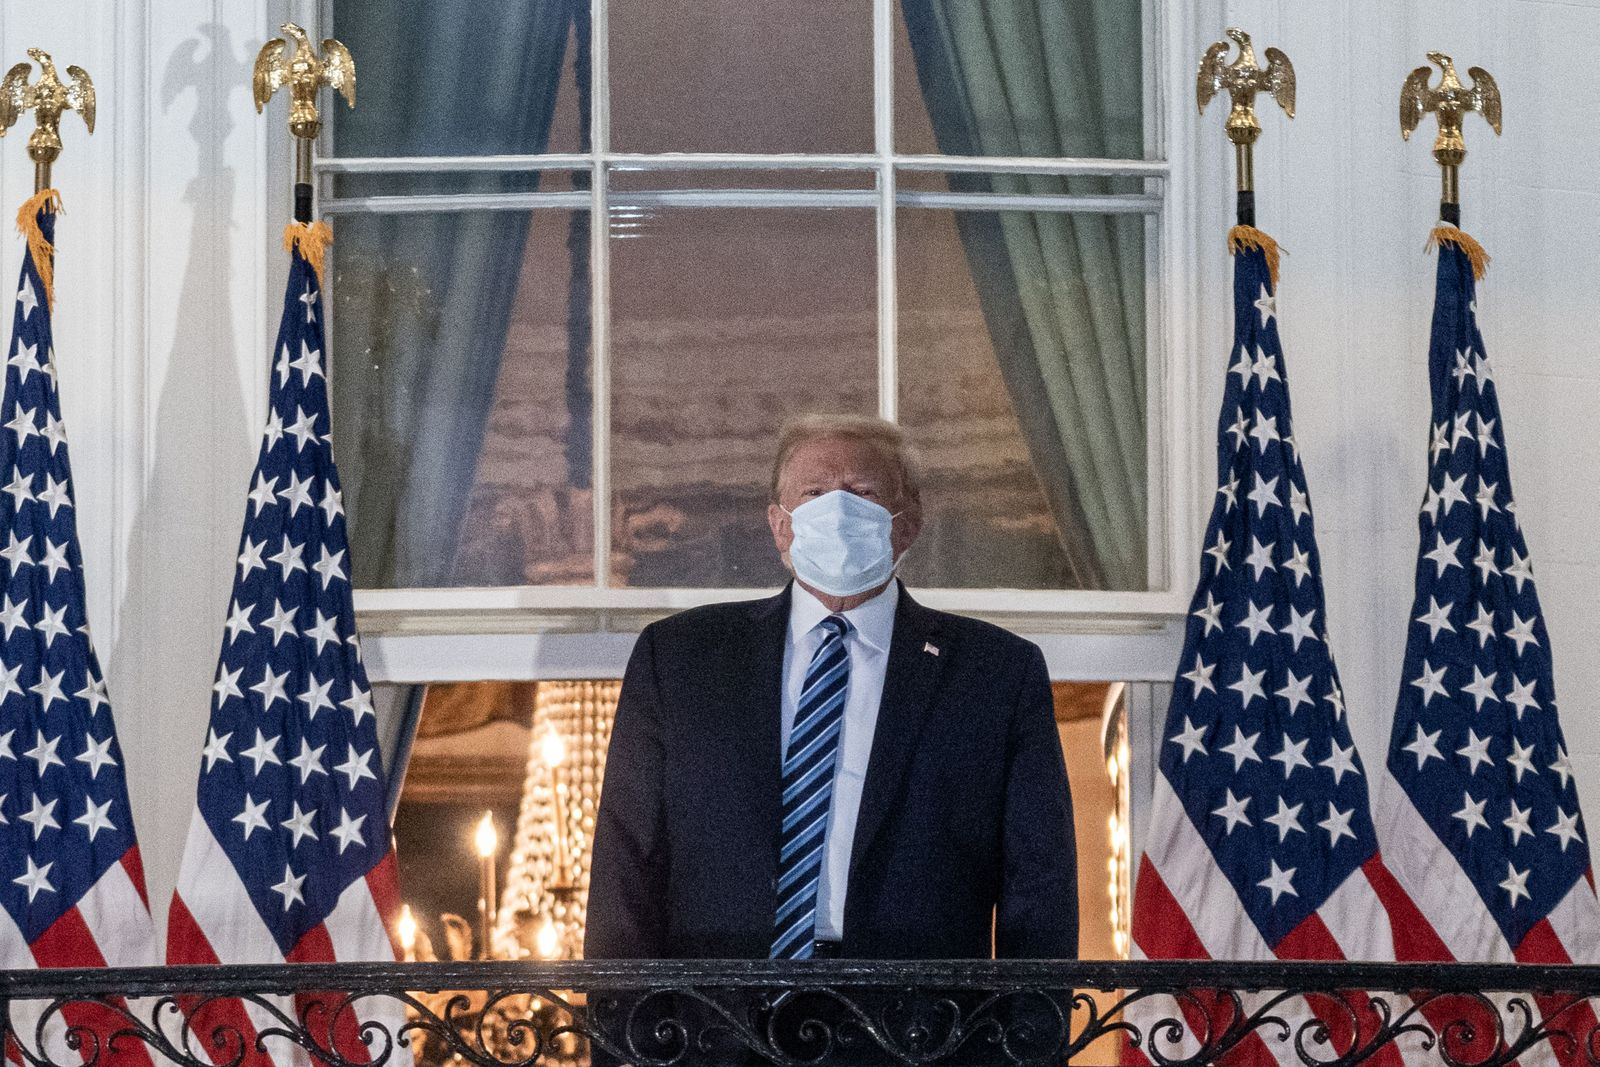 Trump returns to the White House after COVID hospital treatment, Washington, USA - 05 Oct 2020